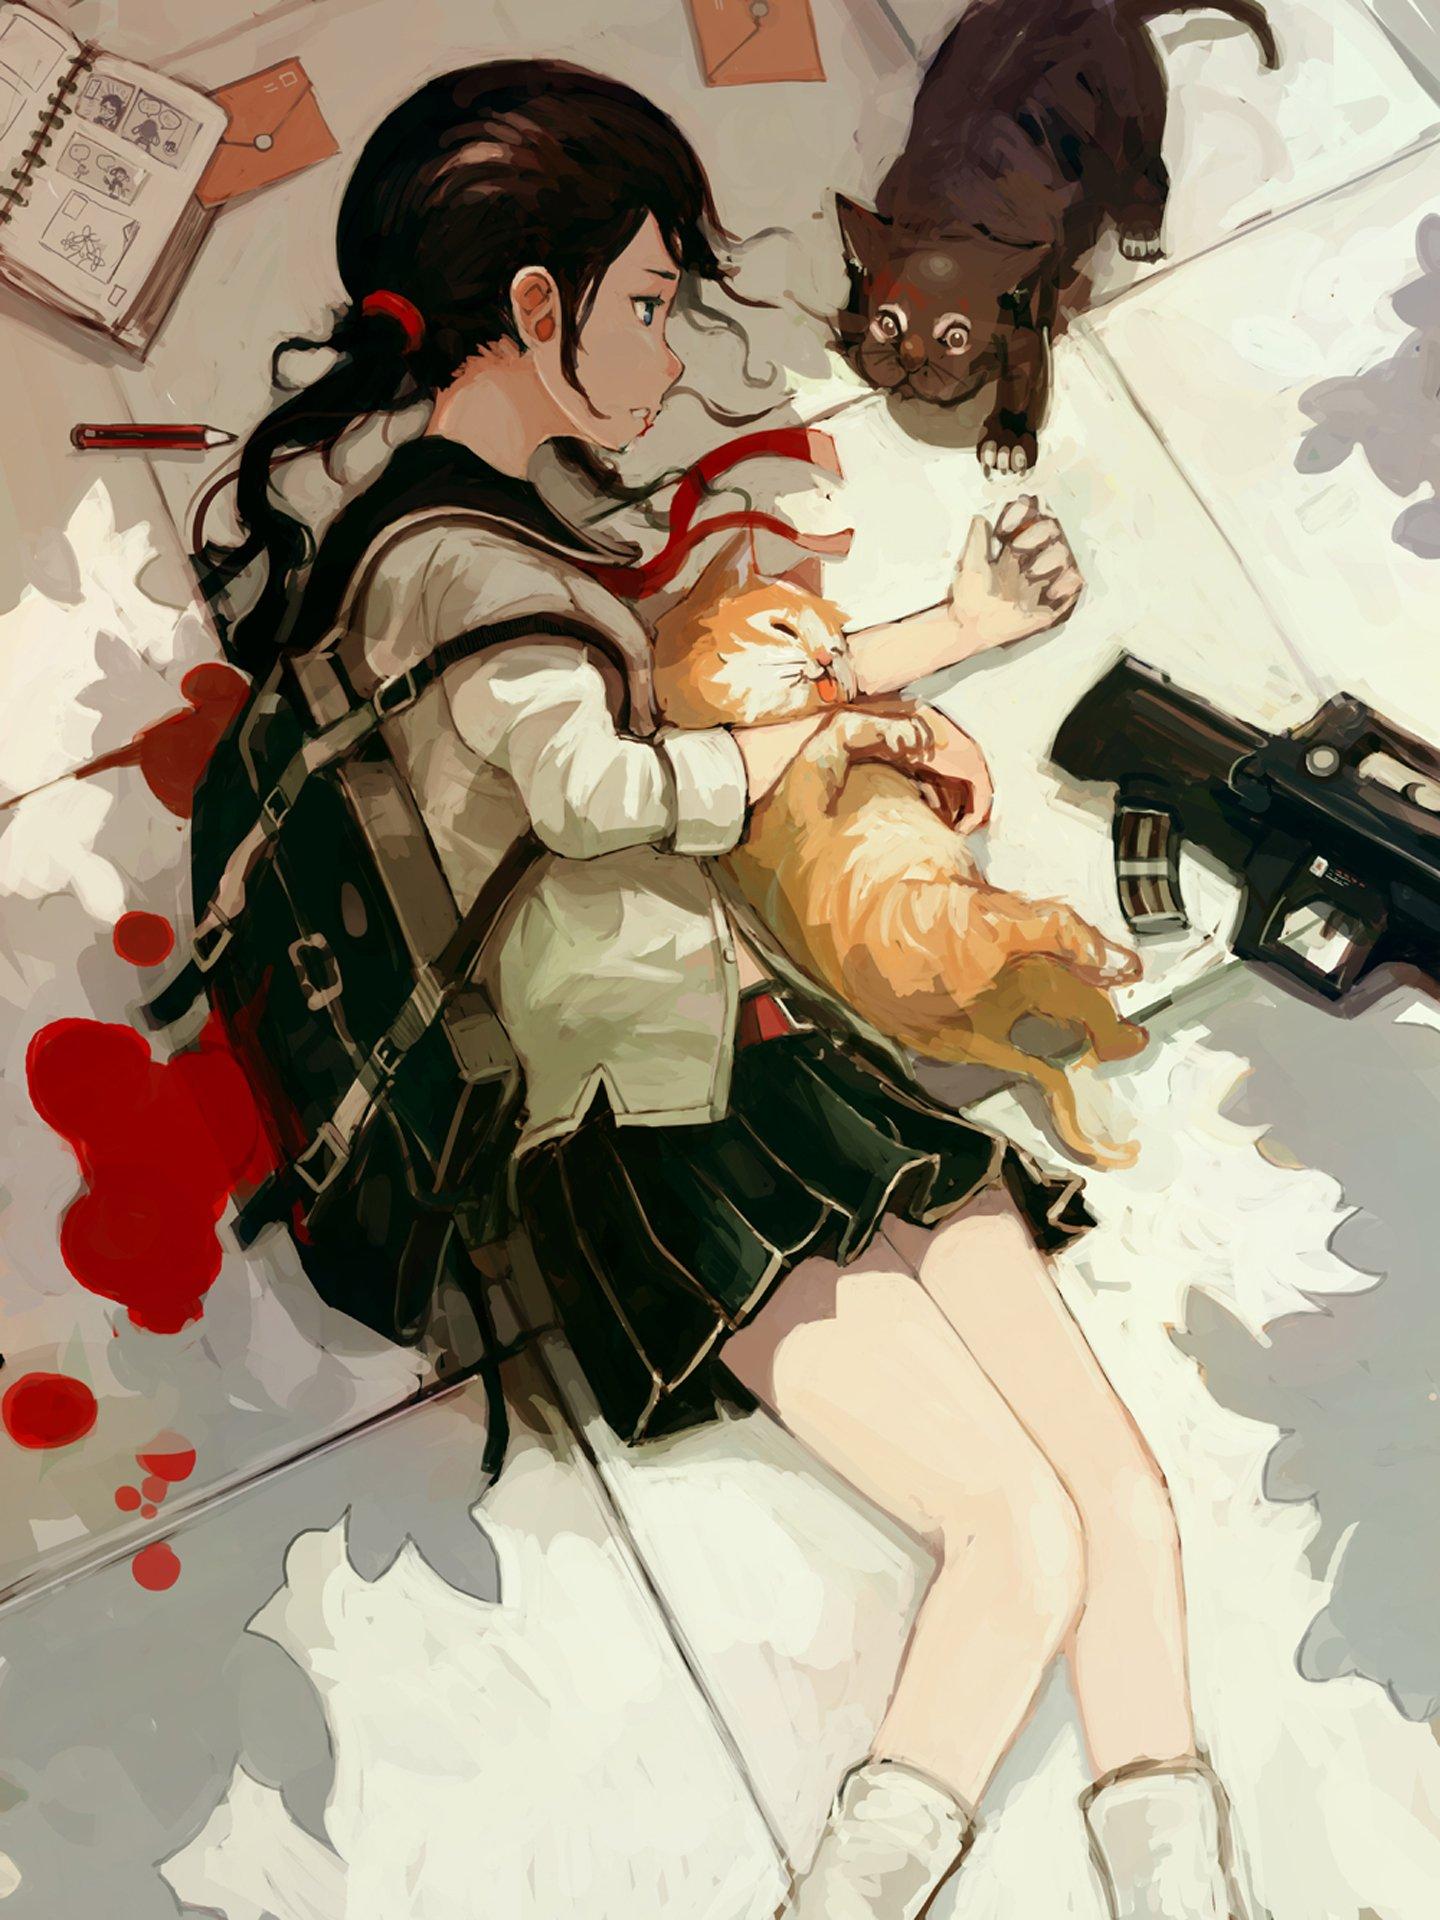 Anime Girl Cats Kitty Blood Book Pencil School Uniform